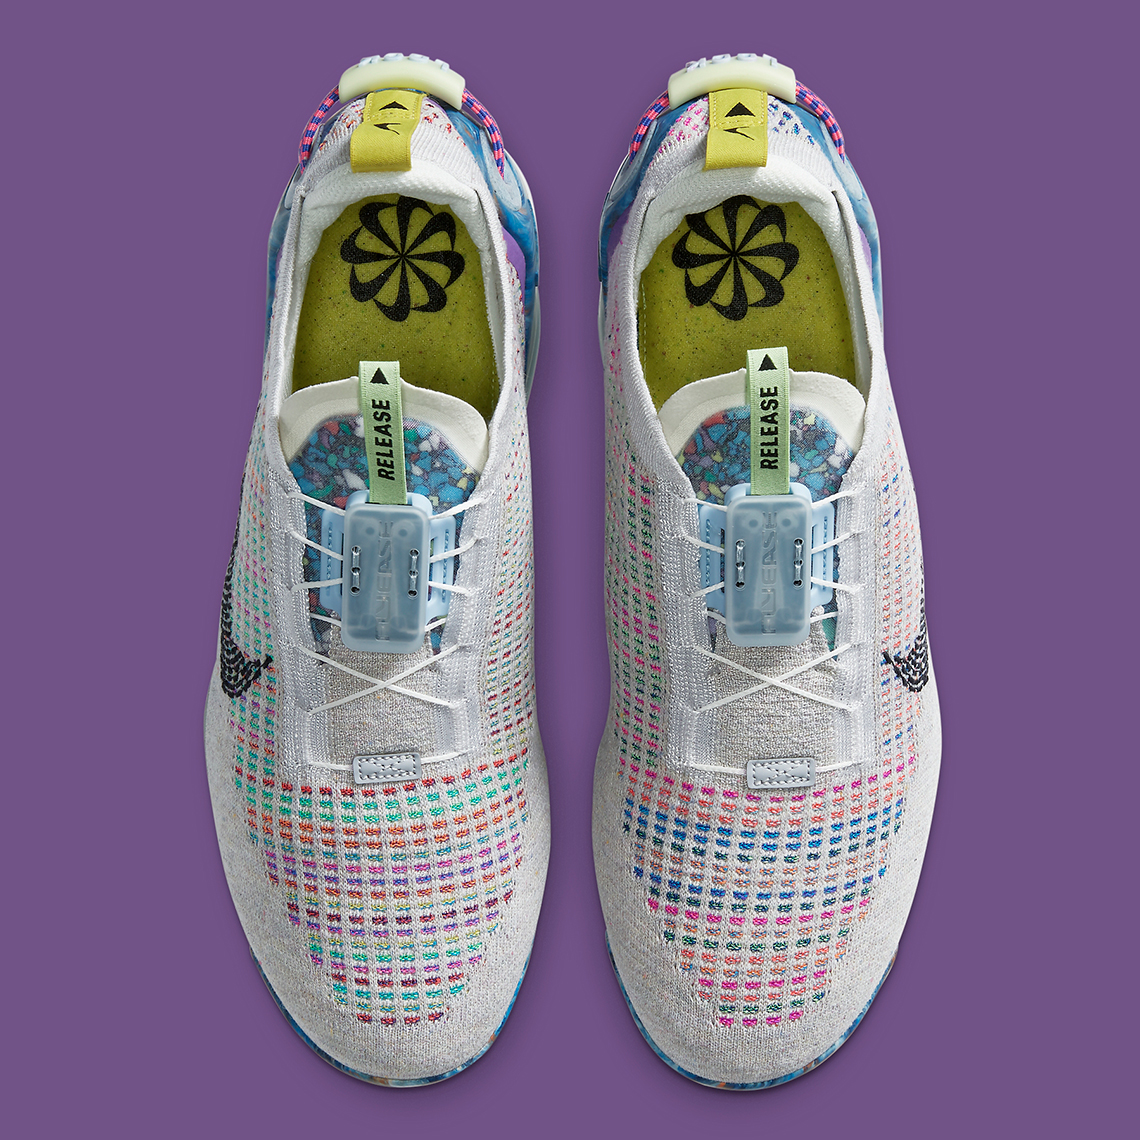 Nike VaporMax 2020 ''Pure Platinum/Muti-Color/Black'' - CJ6740-001